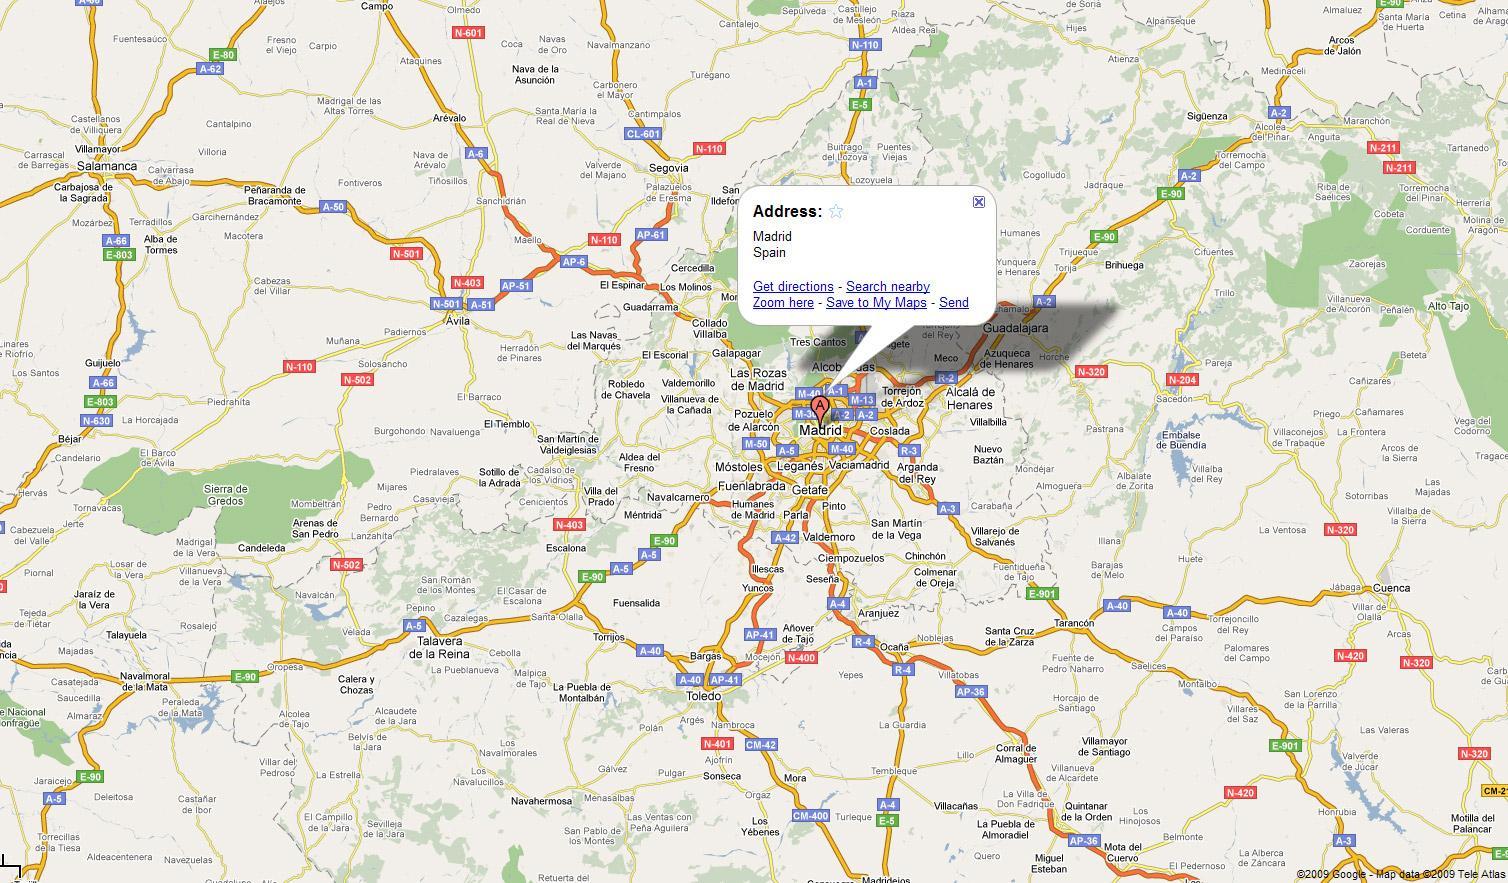 Madrid city map - City map of Madrid Spain (Spain) on san juan puerto rico map, jerez spain map, catalonia spain map, ibiza spain map, world map, andalucia spain map, barcelona map, tokyo japan map, zurich switzerland map, london england map, beijing china map, sydney australia map, rio de janeiro brazil map, seville spain map, france map, moscow spain map, moscow russia map, granada spain map, oslo norway map, stockholm sweden map,